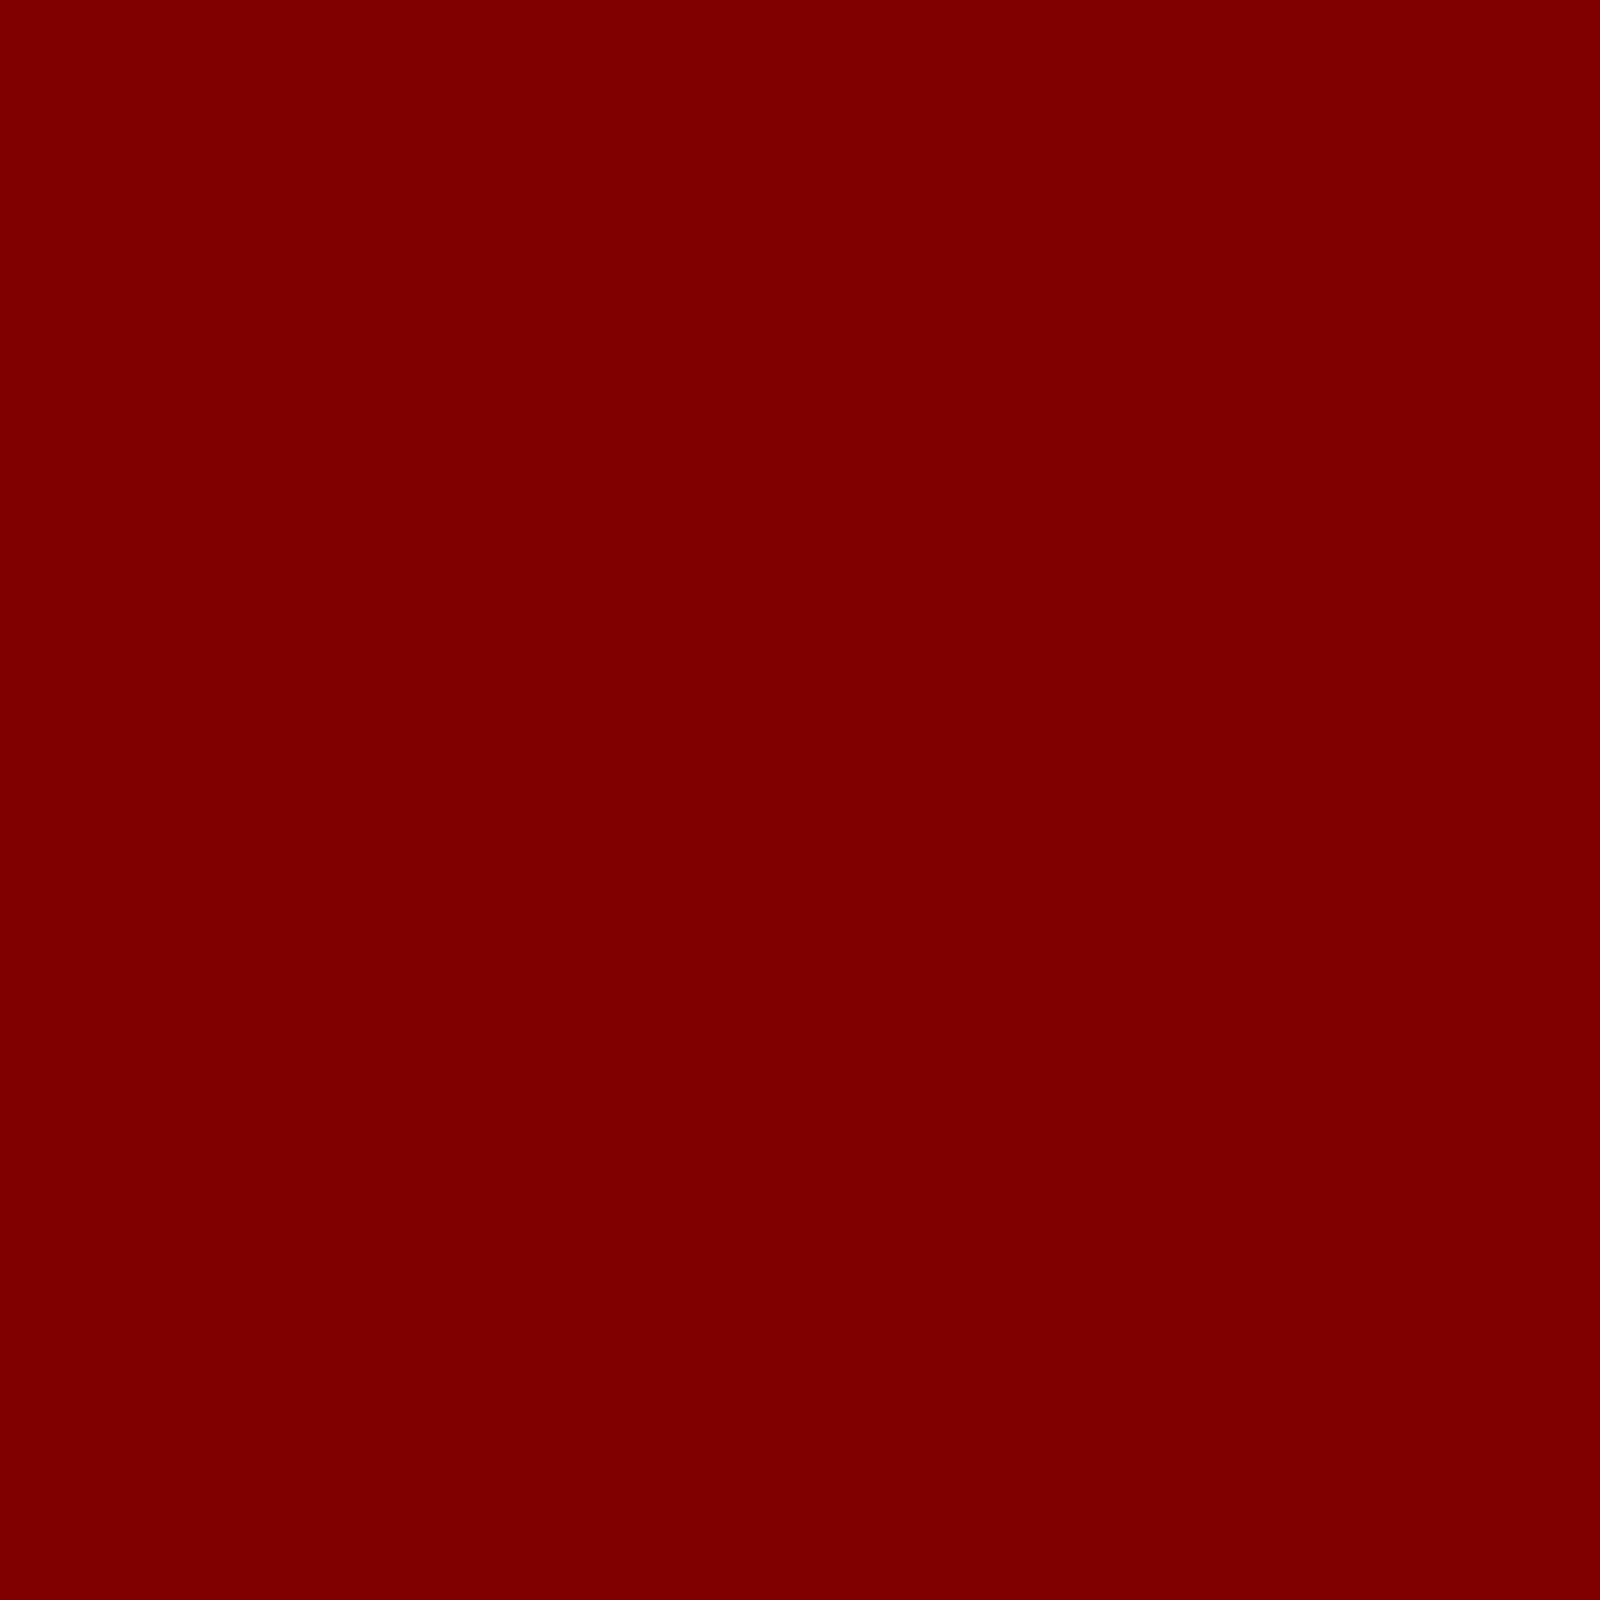 Maroon Button SVG Clip arts